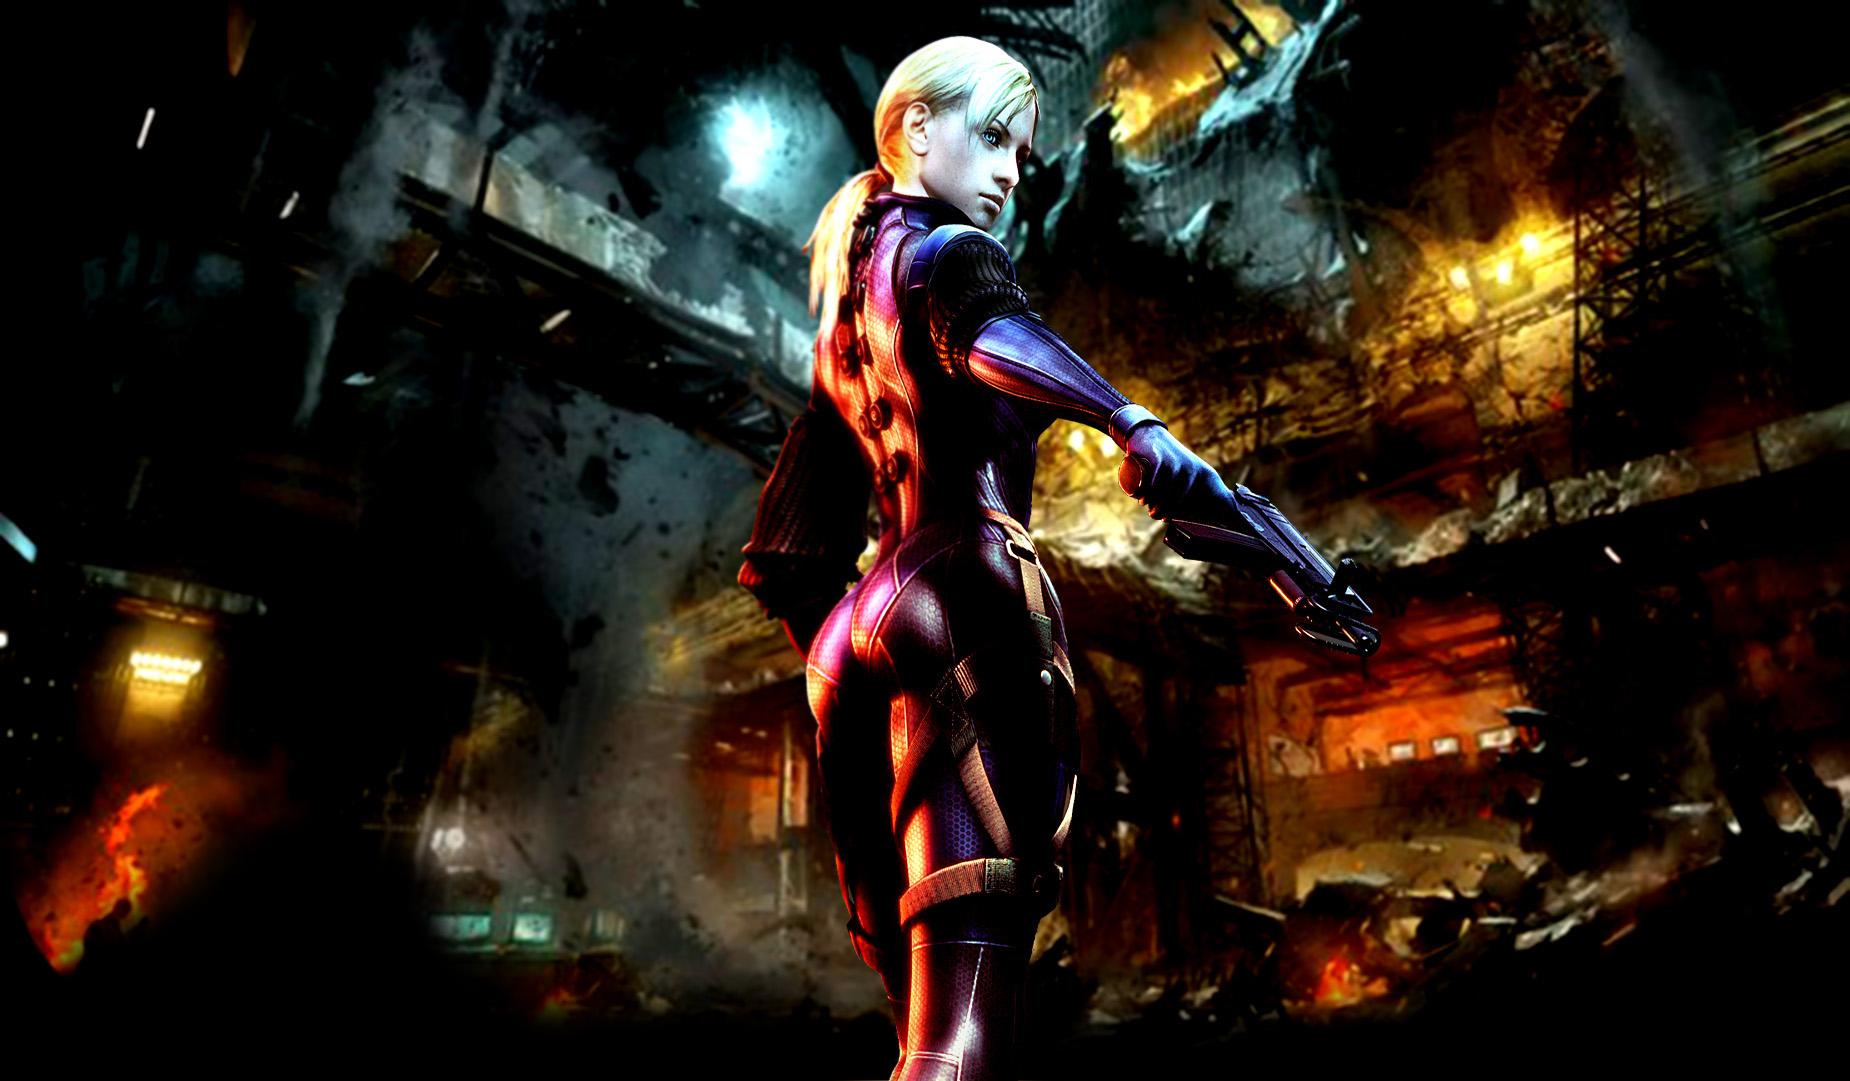 Jill Valentine On Resident Evil 6 By Sniram On Deviantart